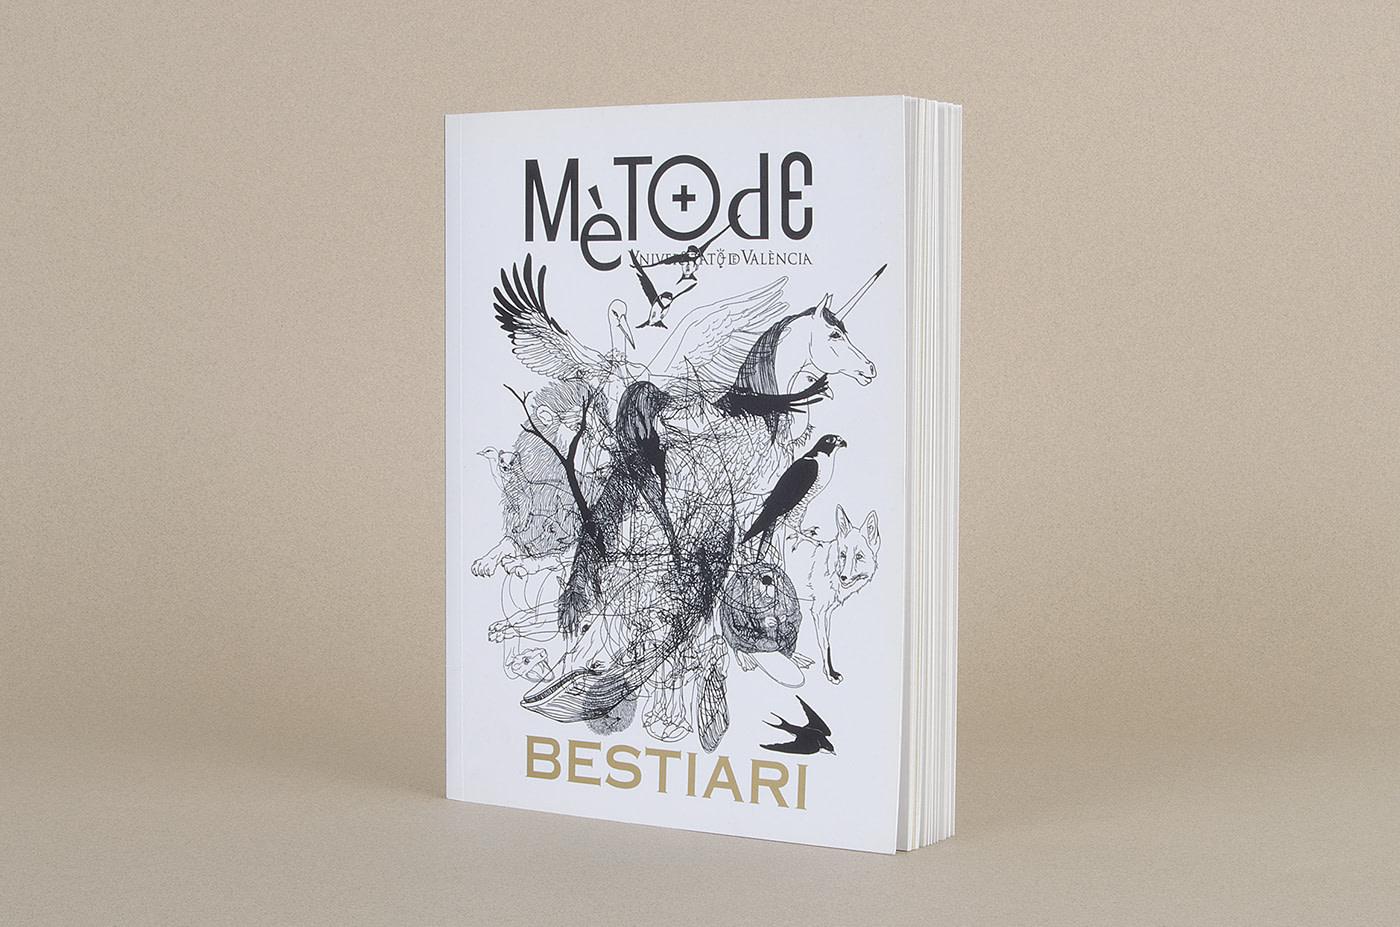 marenostrumgraficas revista metode bestiari